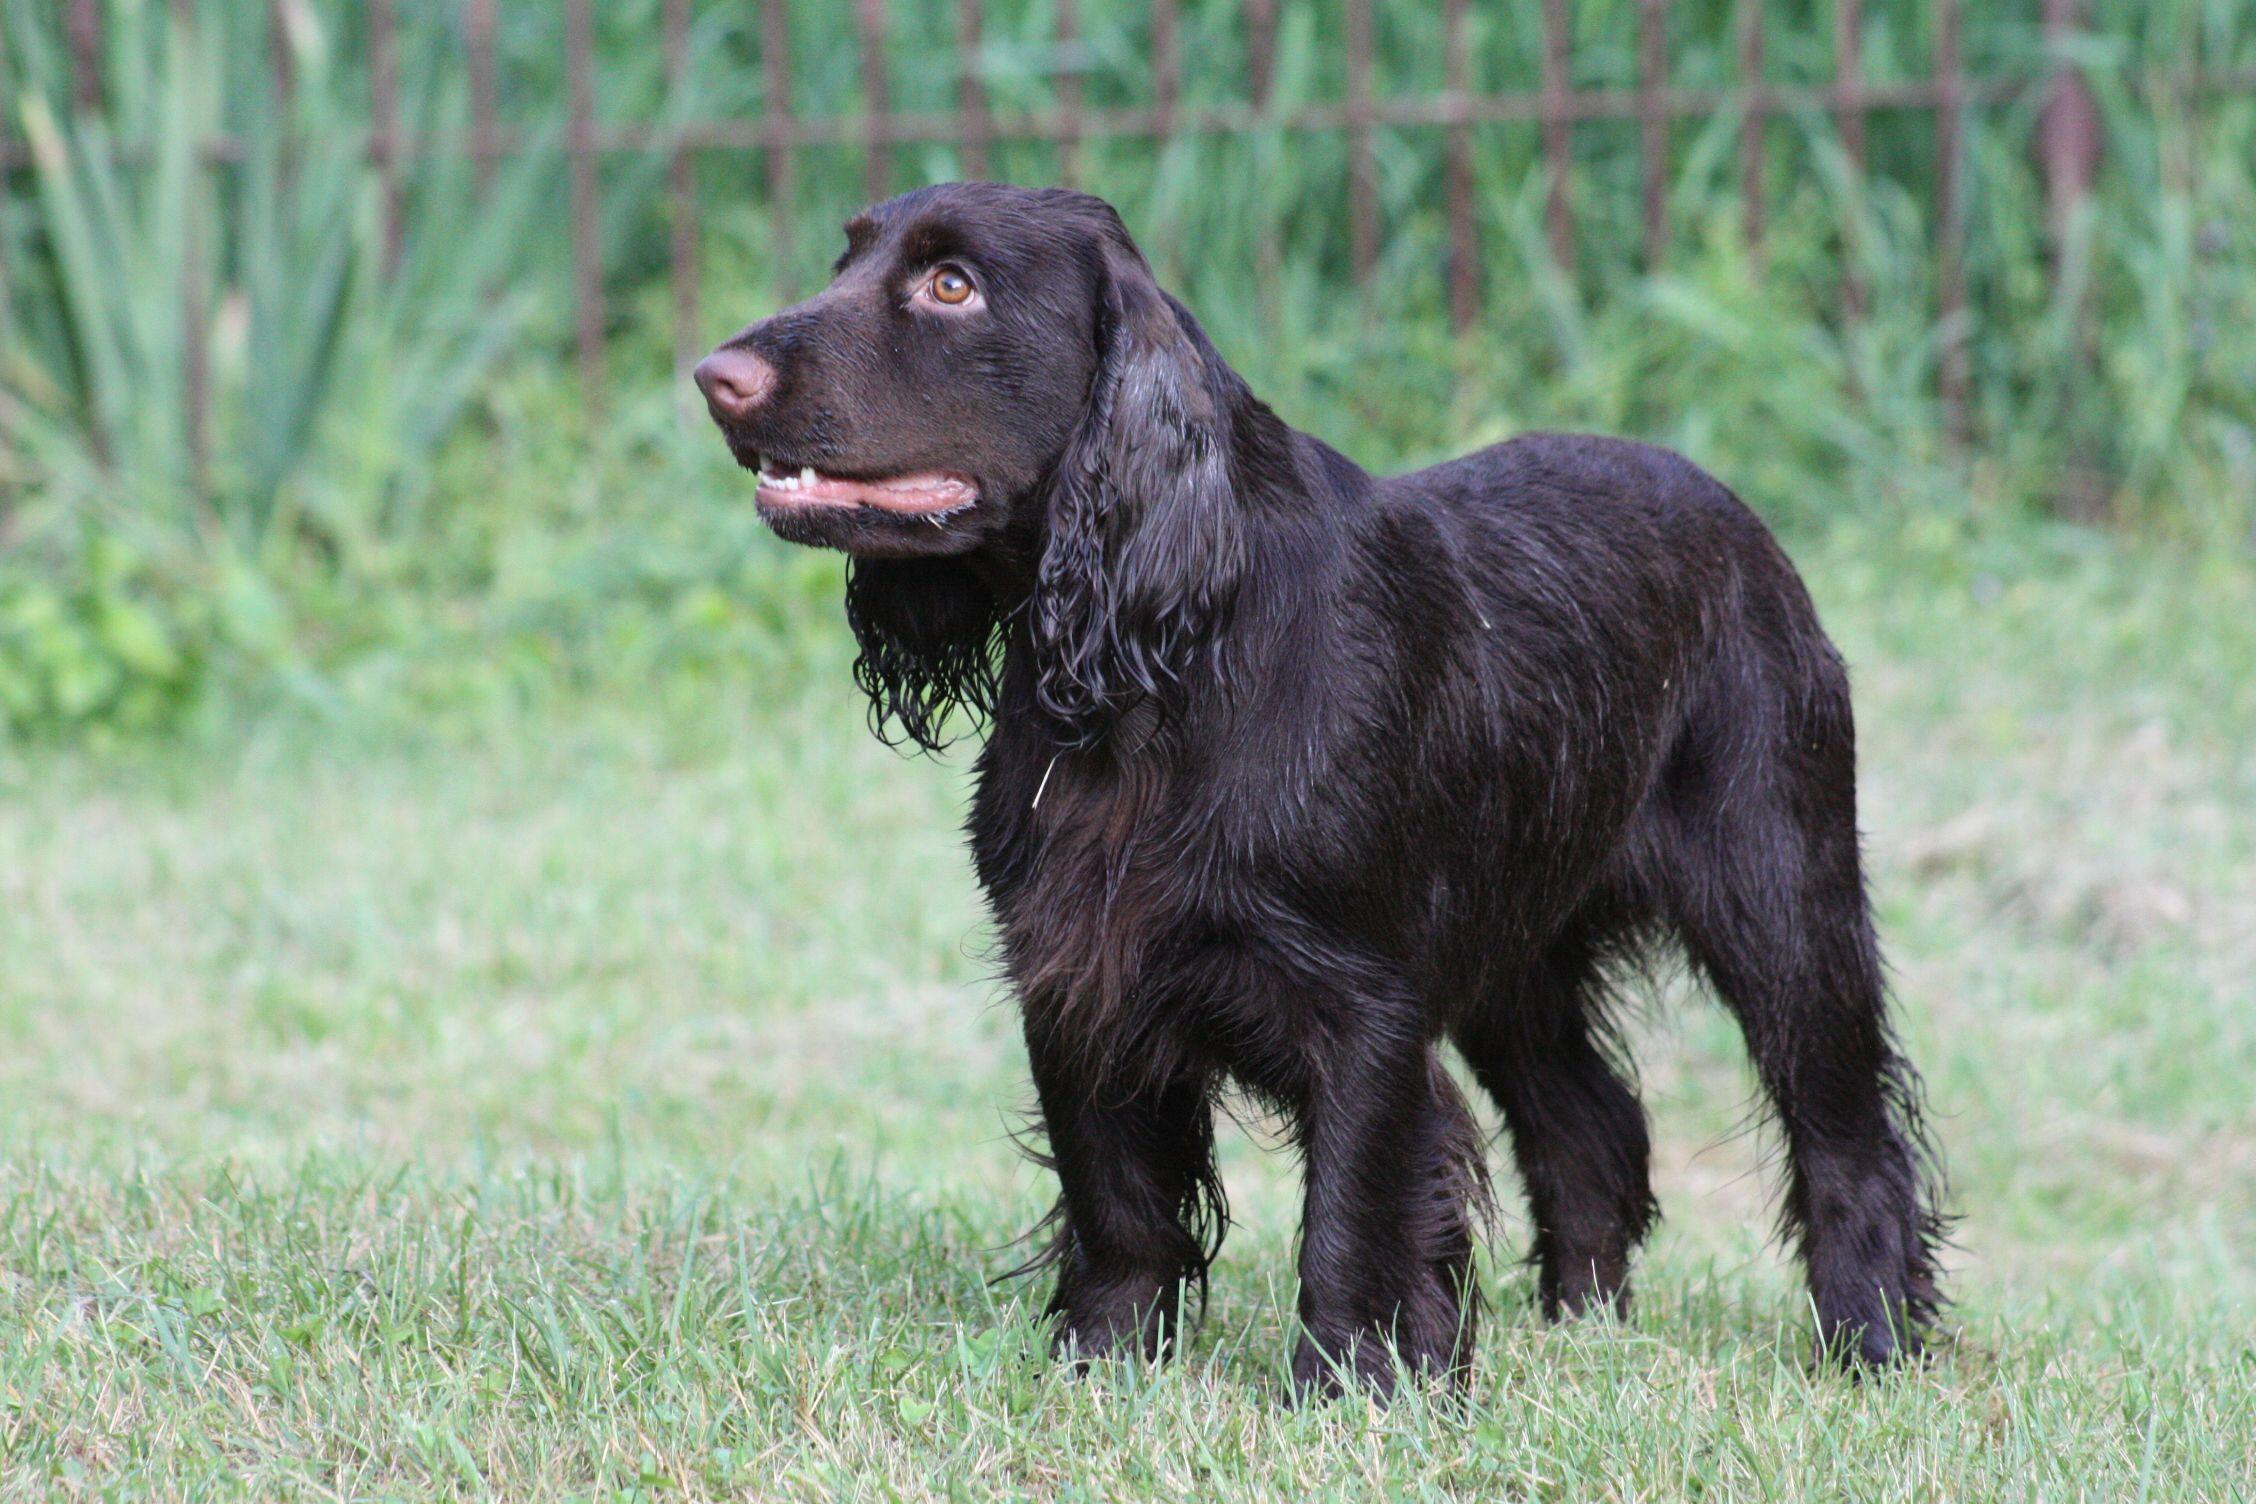 Field Spaniel #Spaniels #Dogs #Puppy | Field Spaniel ...